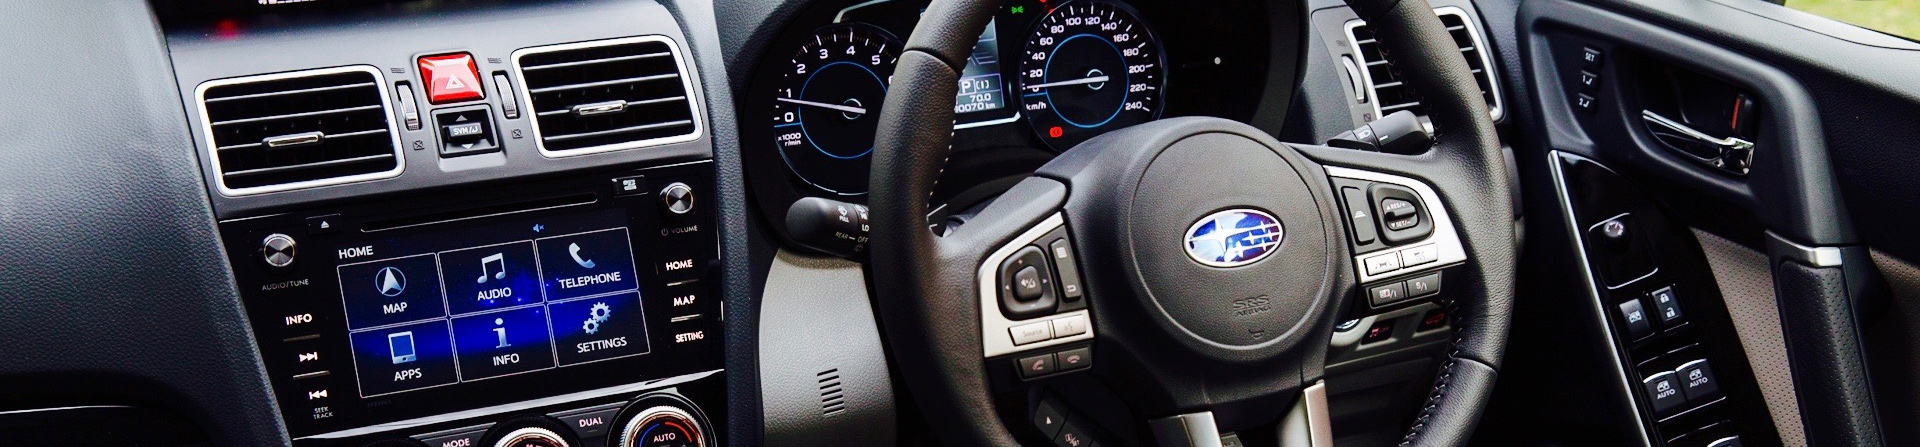 Subaru Forester Image 3